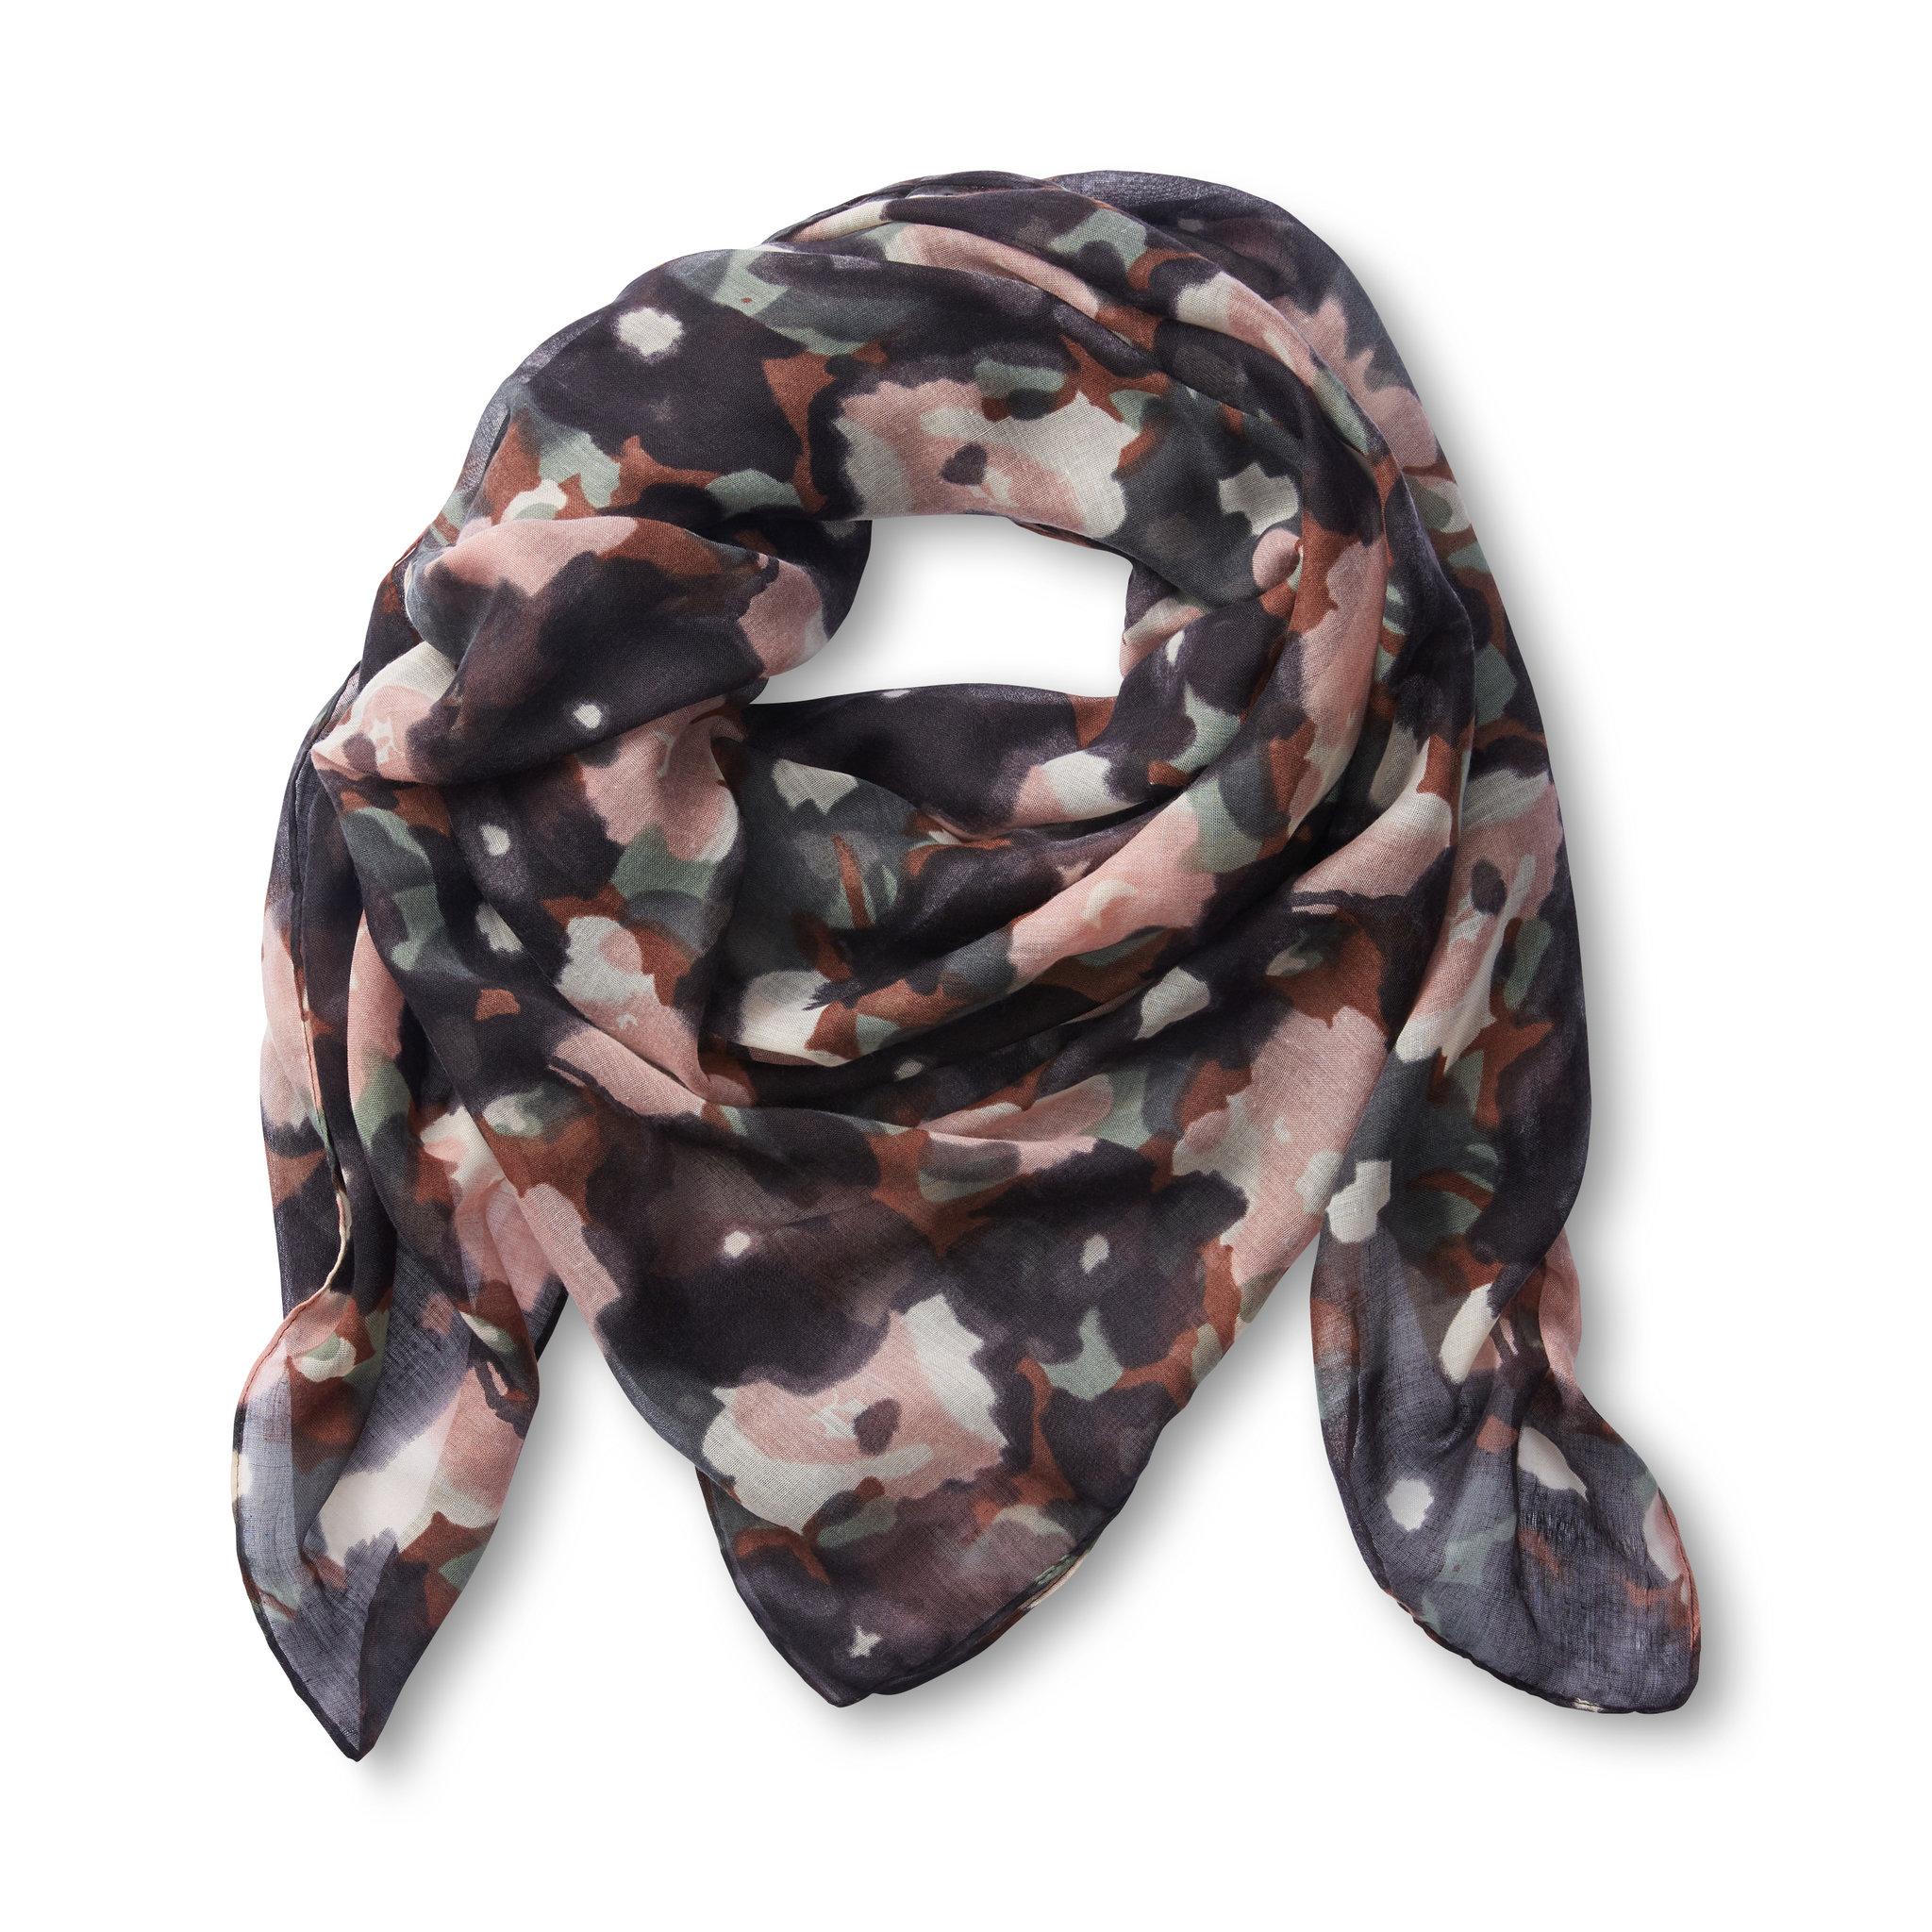 Scarf - Halsdukar   scarves - Köp online på åhlens.se! 945545d952448